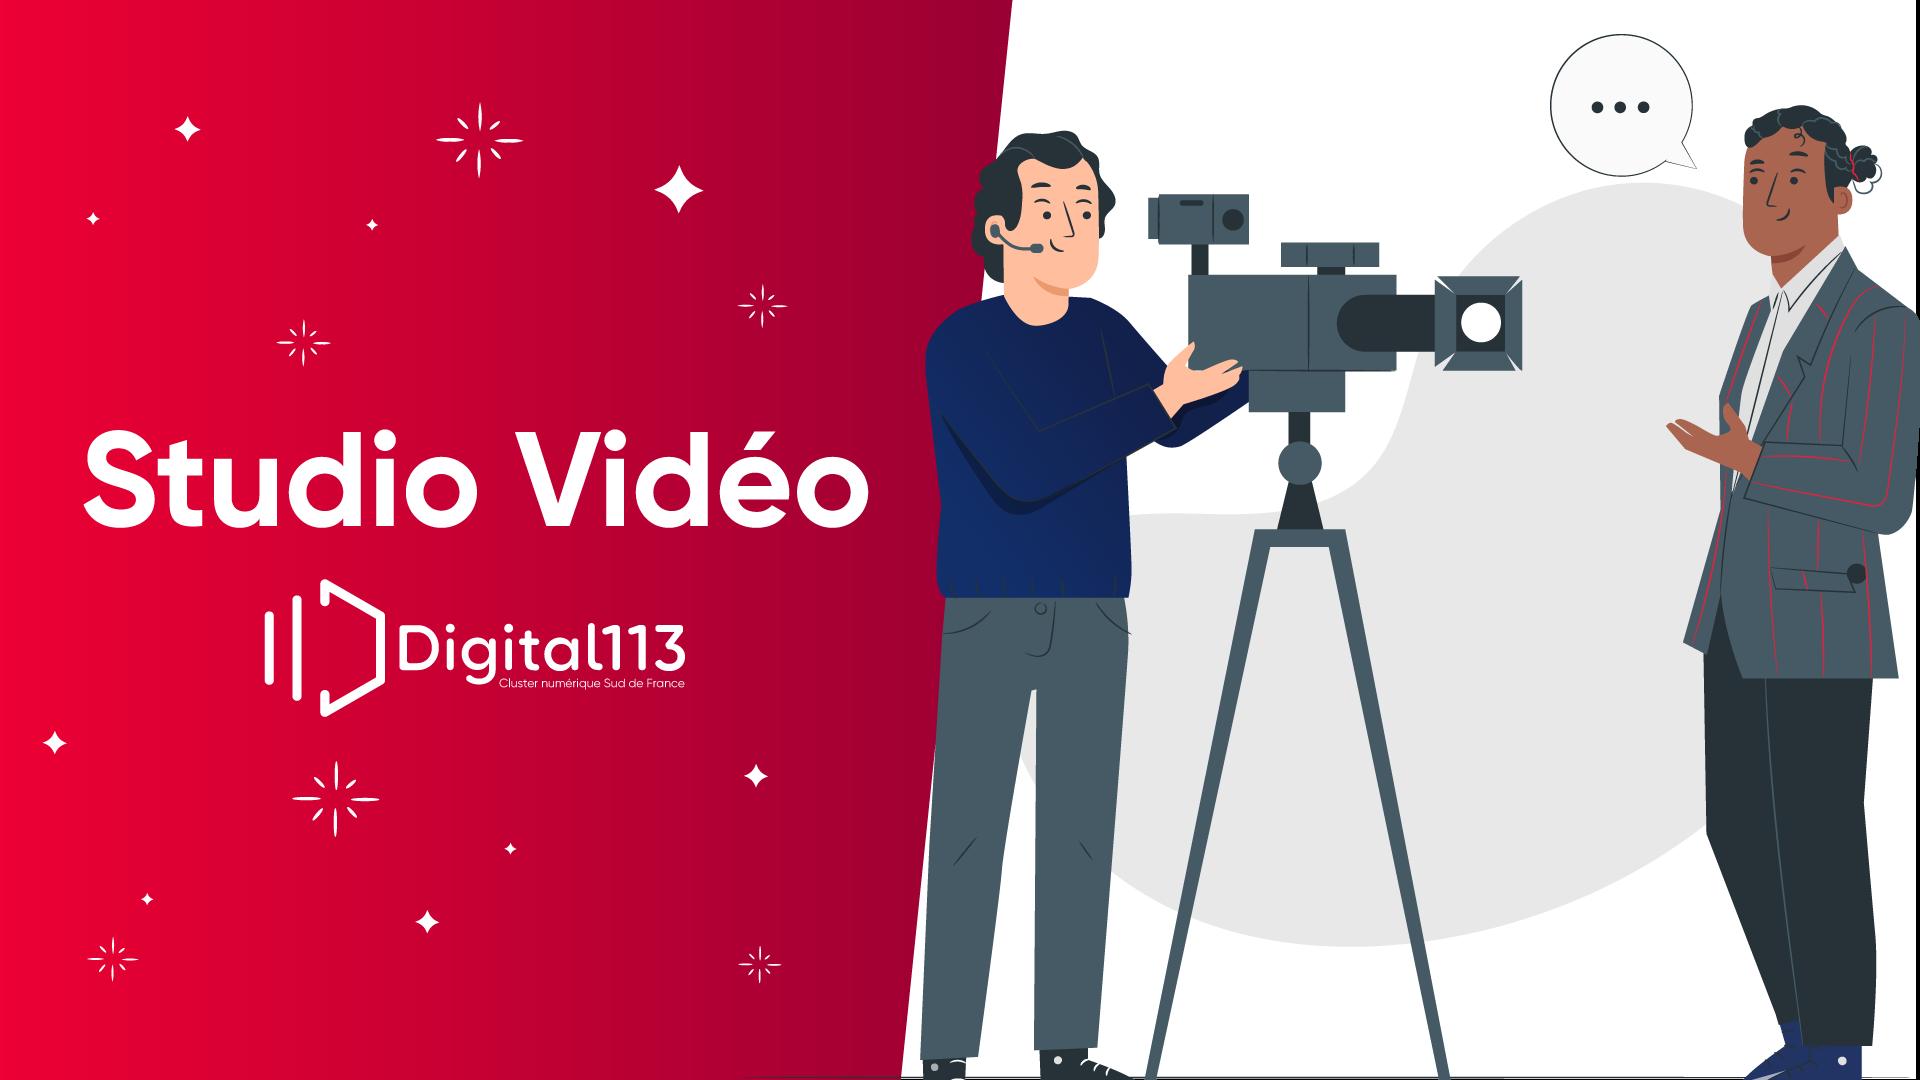 Studio vidéo by digital 113